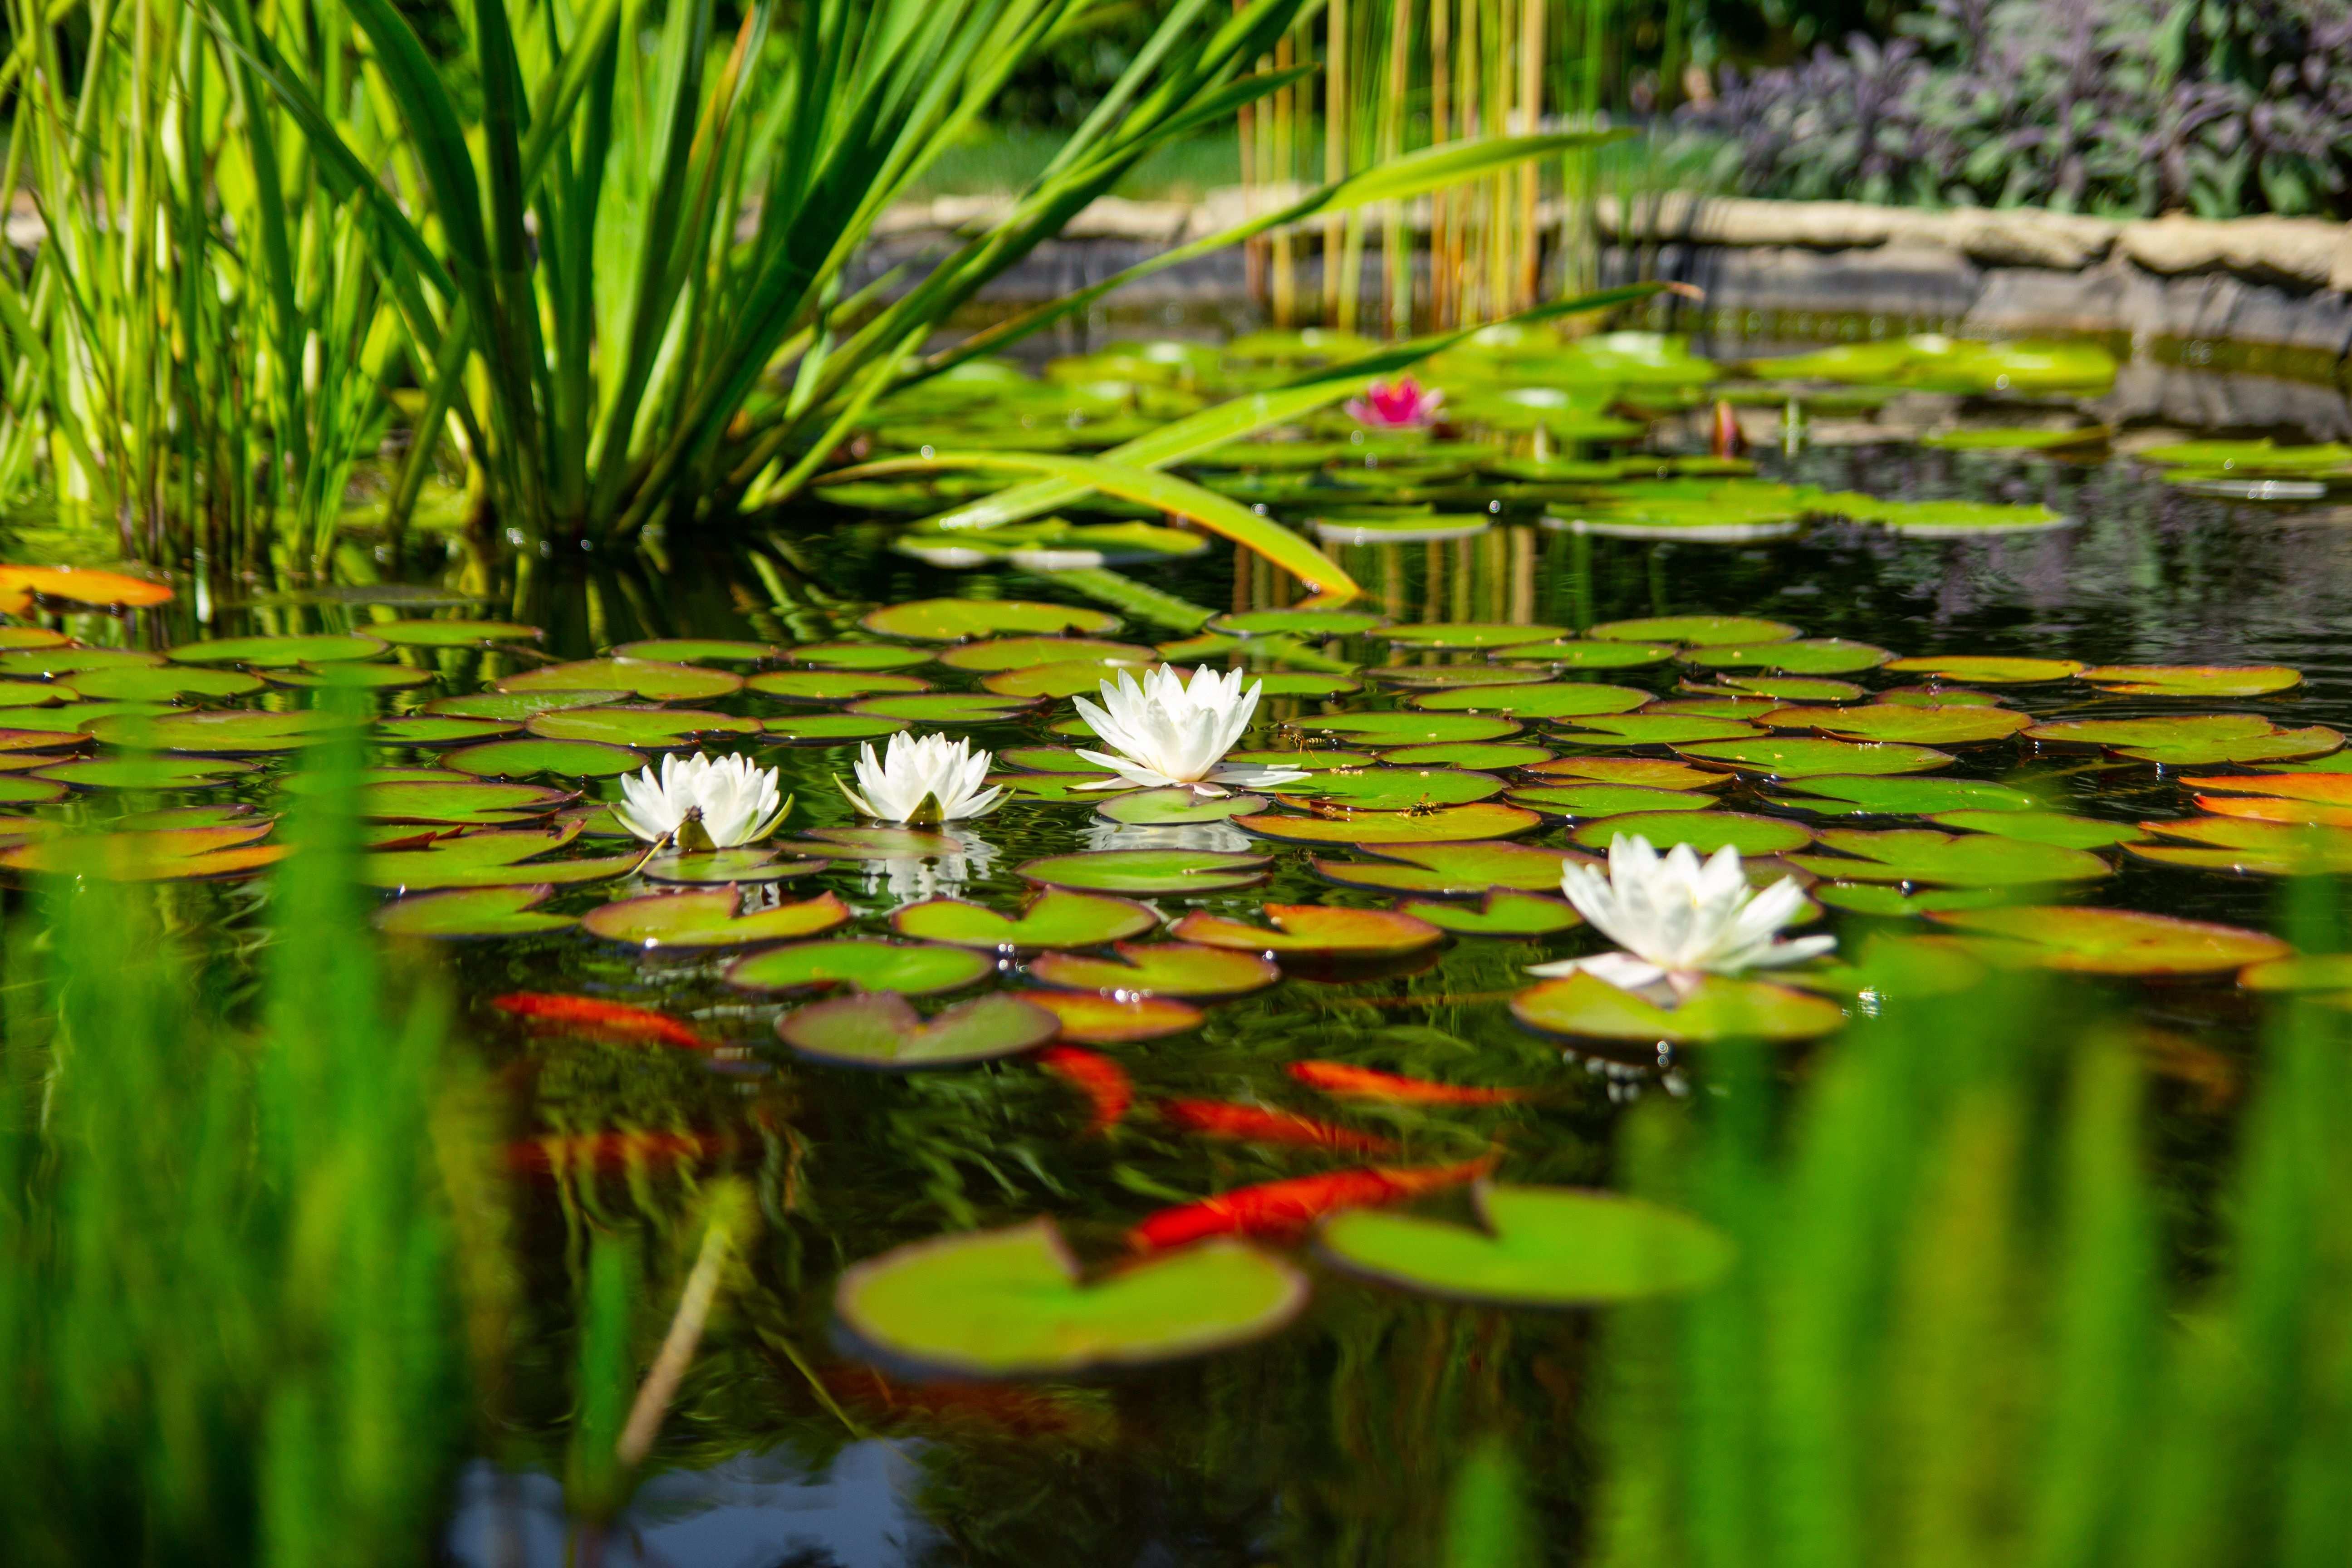 Quelles sont les plantes de bassin